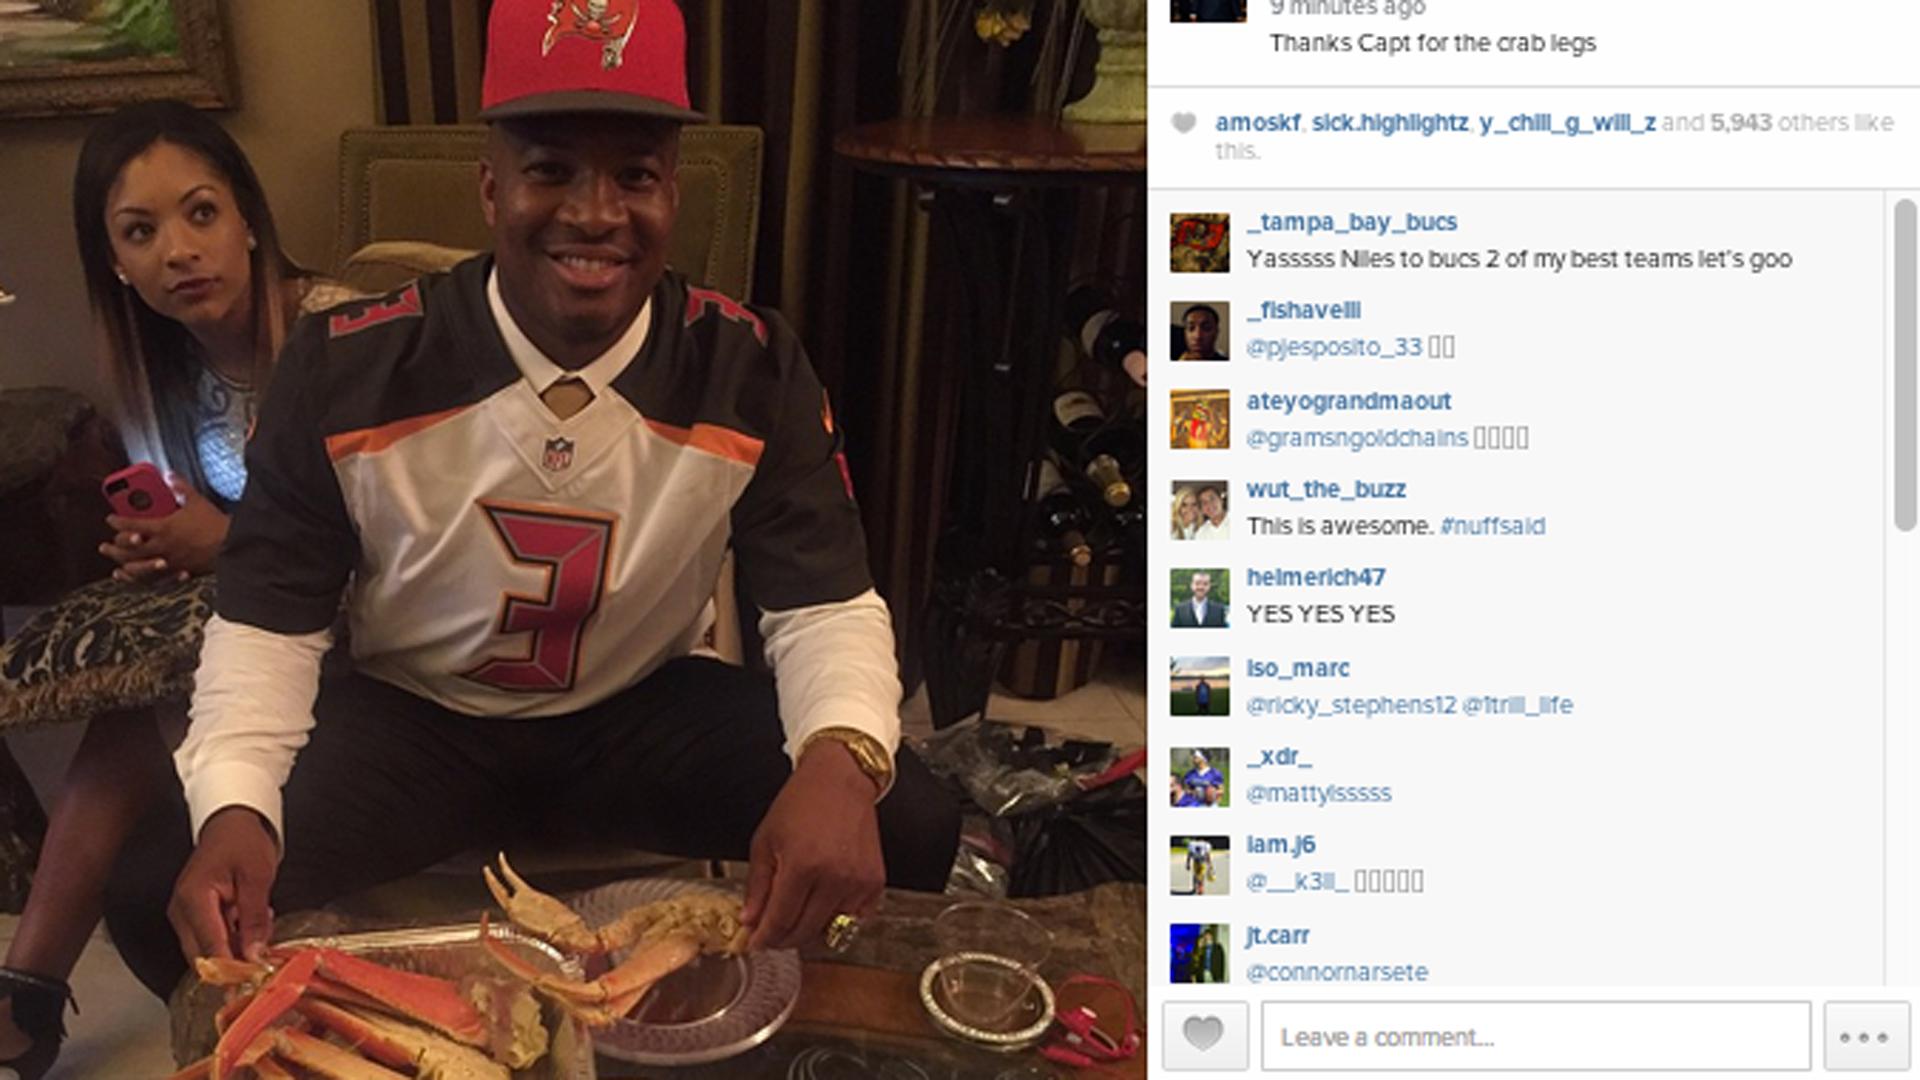 Jameis Winston celebrates draft night with crab legs | NFL ...